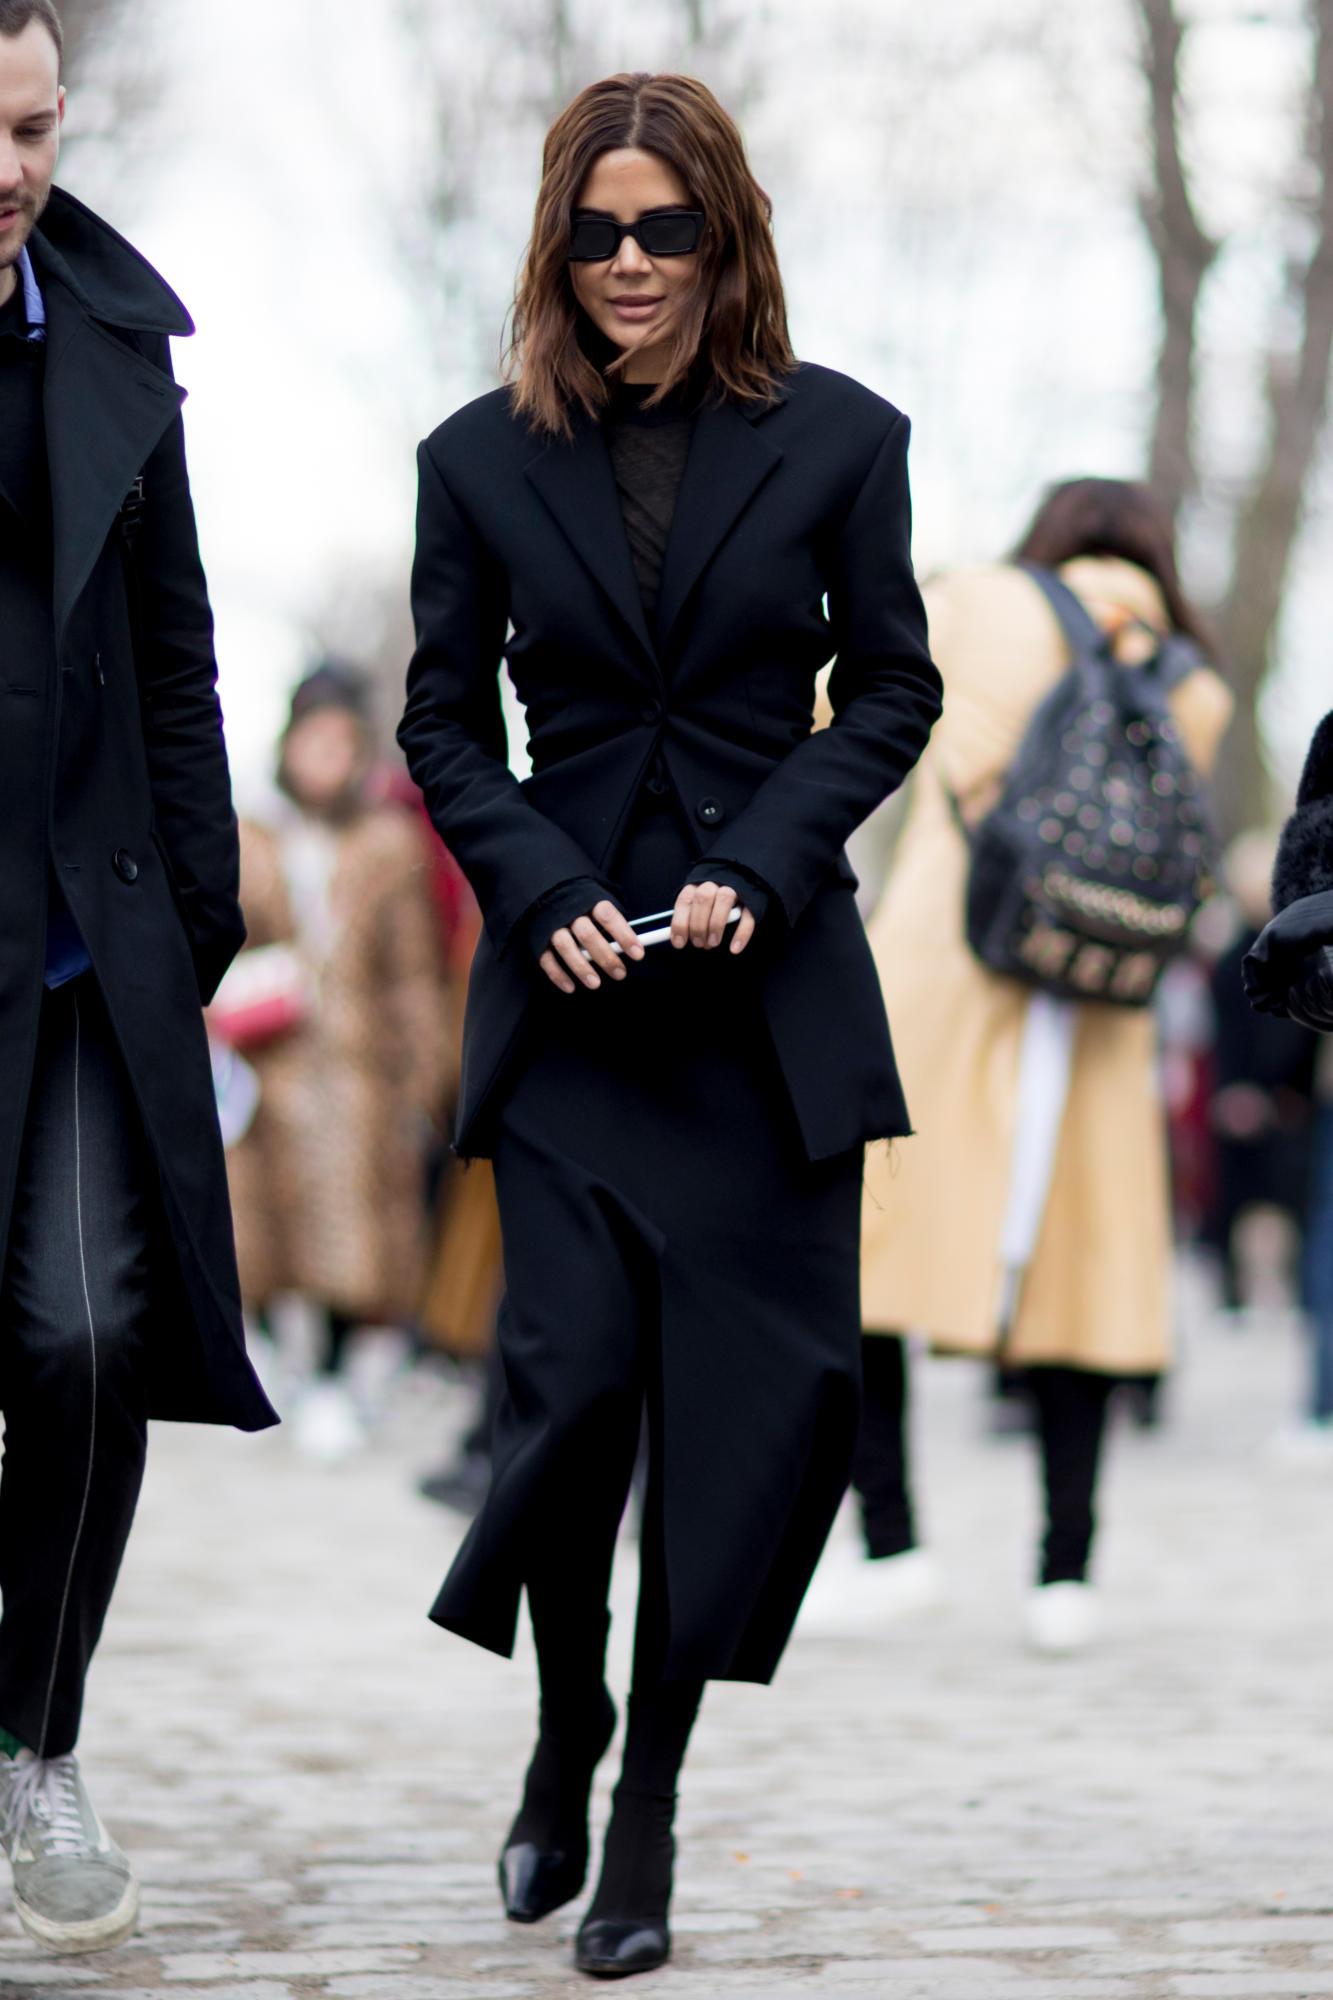 paris-fashion-week-street-style-fall-2018-day-4-53.jpg